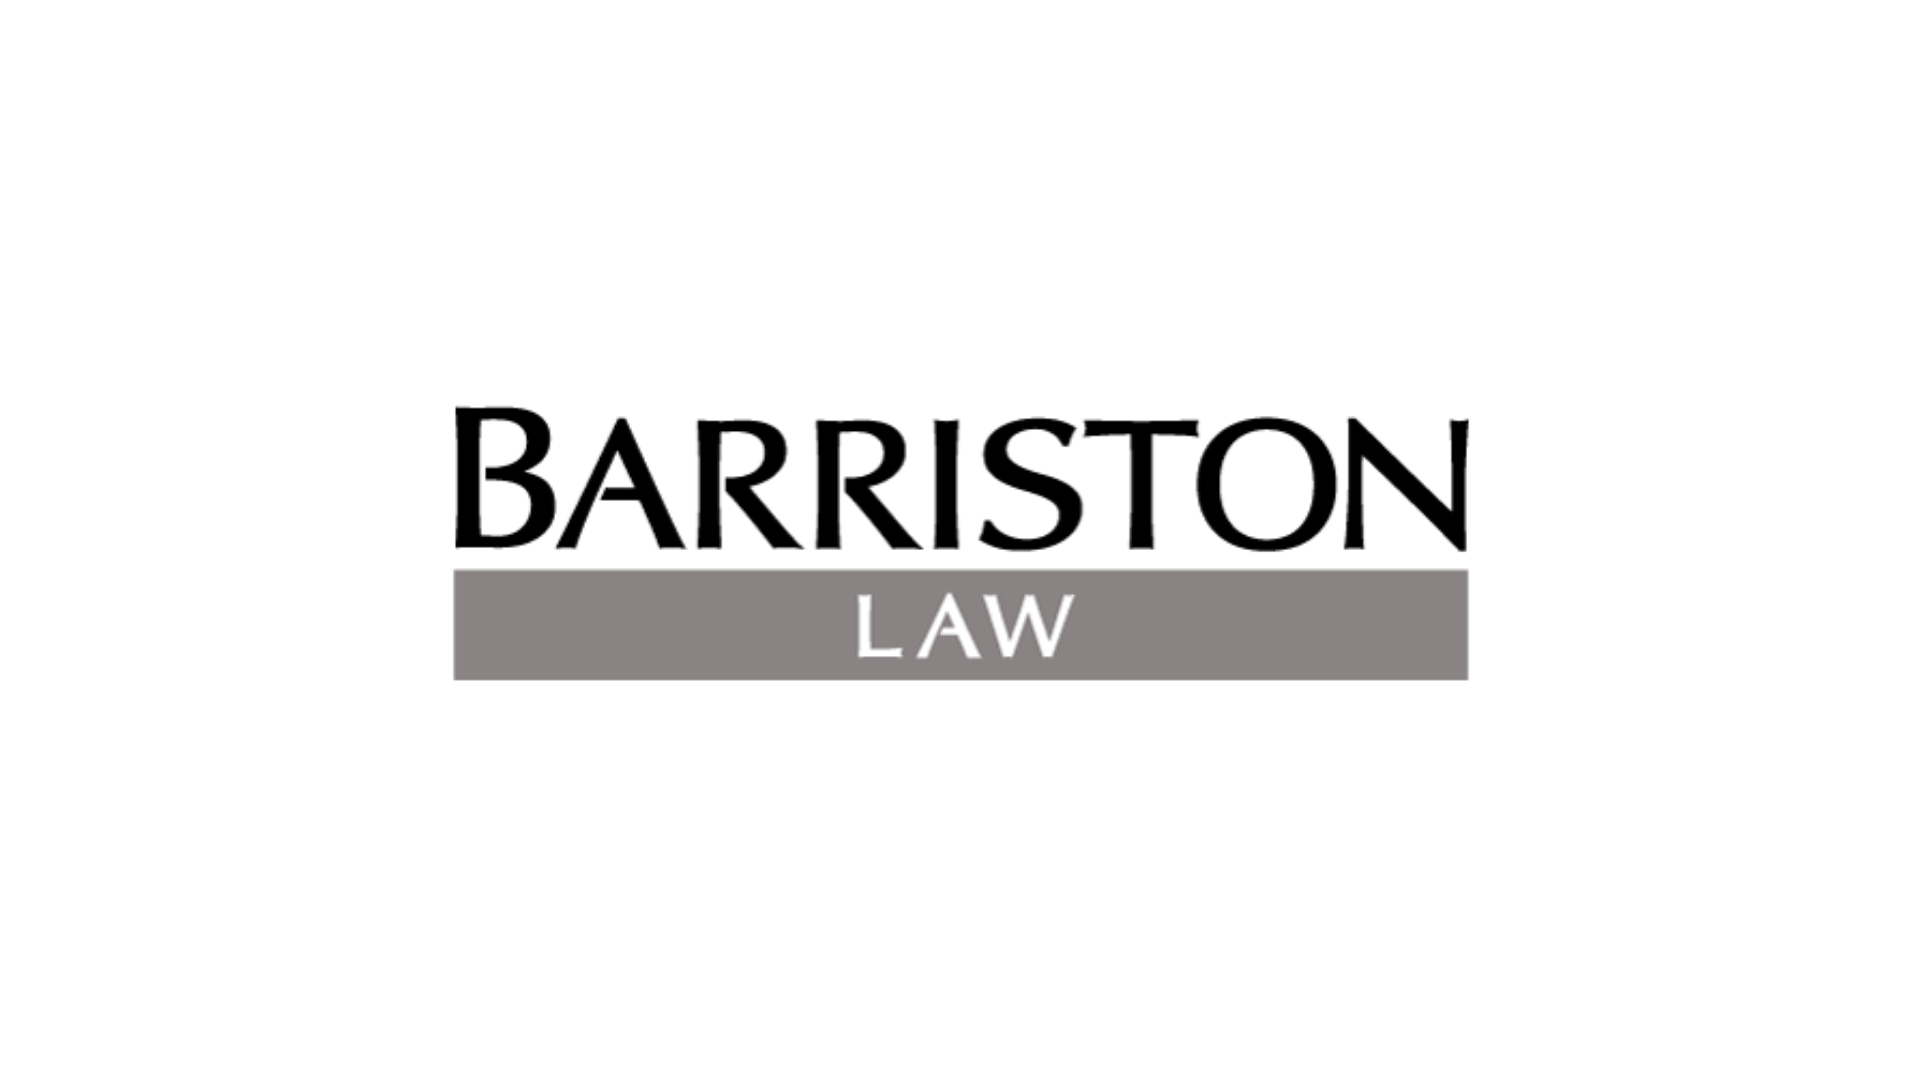 https://xceleratesummit.co/wp-content/uploads/2021/09/Barriston-1.png